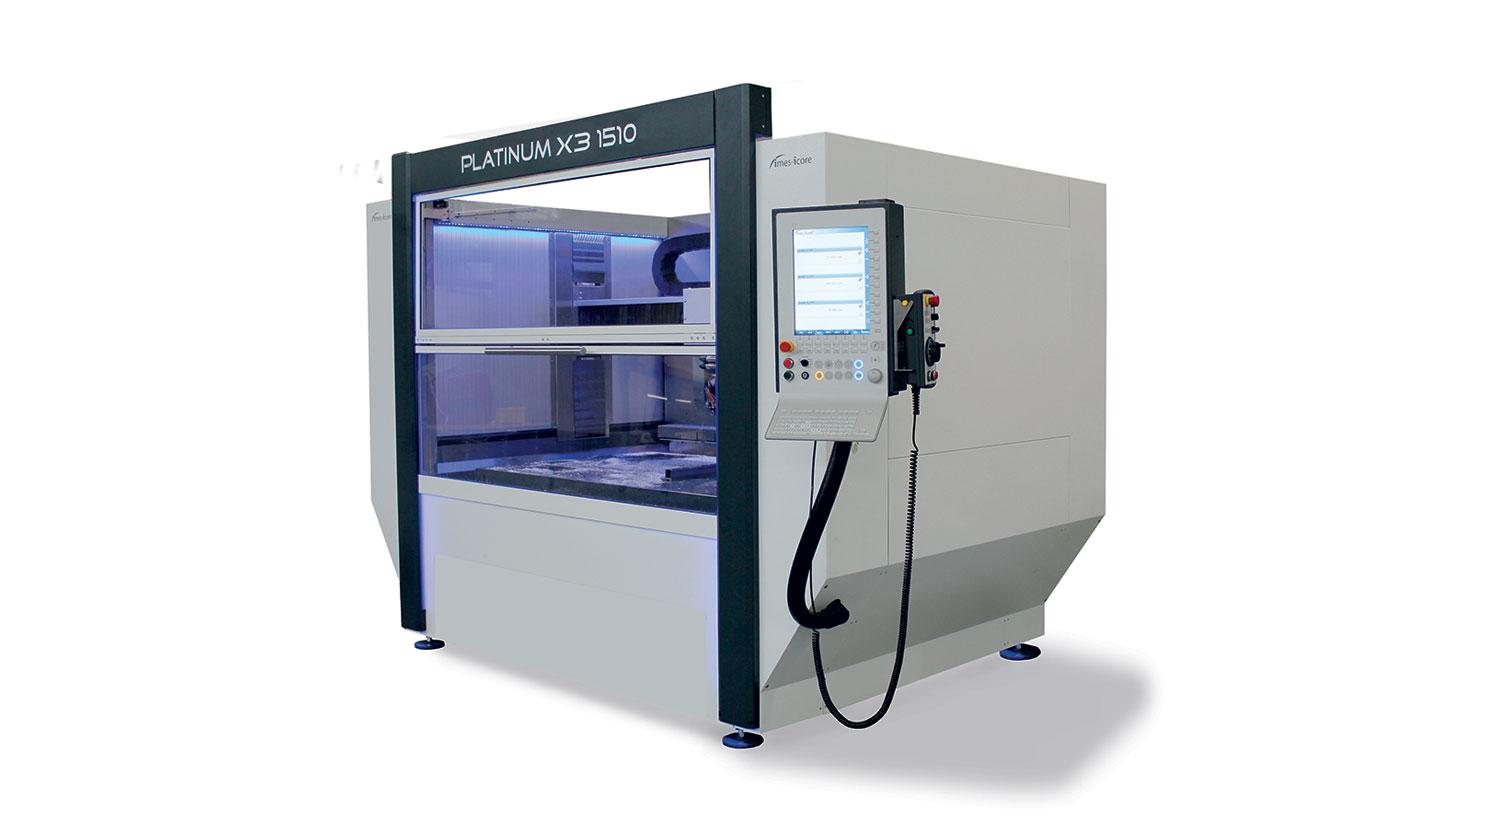 INT micro milling rapid prototyping CNC Imes Icore Platinum X3